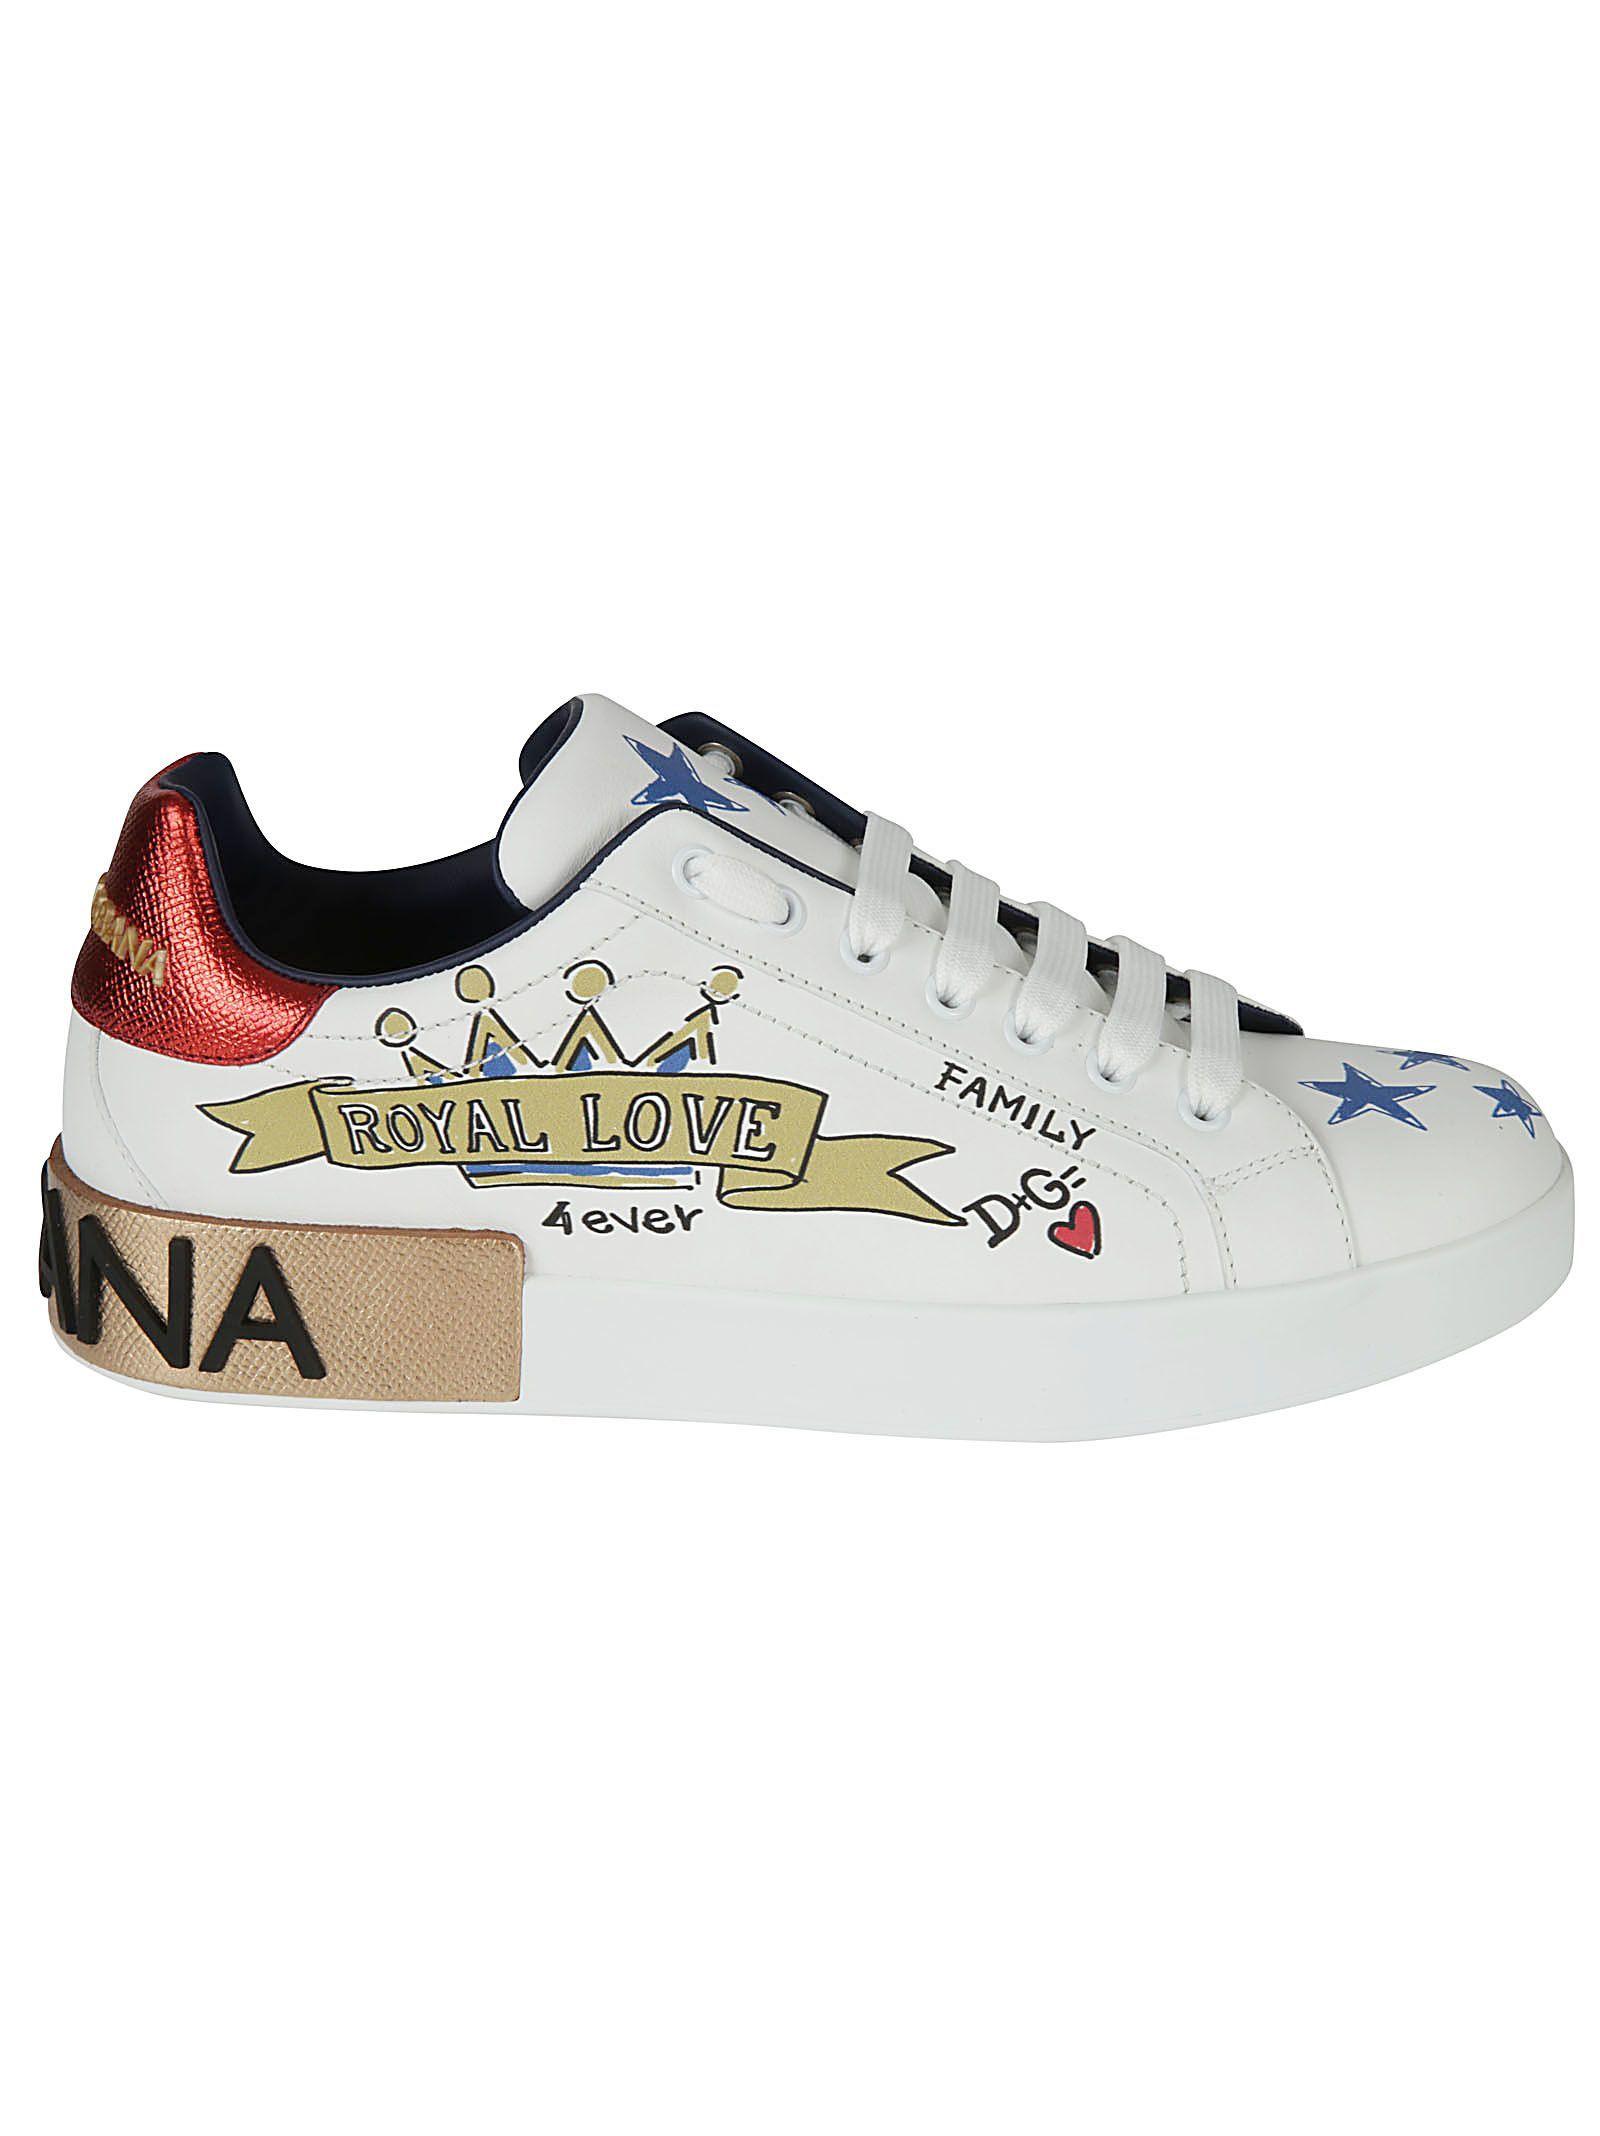 89a69f1d DOLCE & GABBANA PORTOFINO SNEAKERS. #dolcegabbana #shoes # High End  Mens Shoes